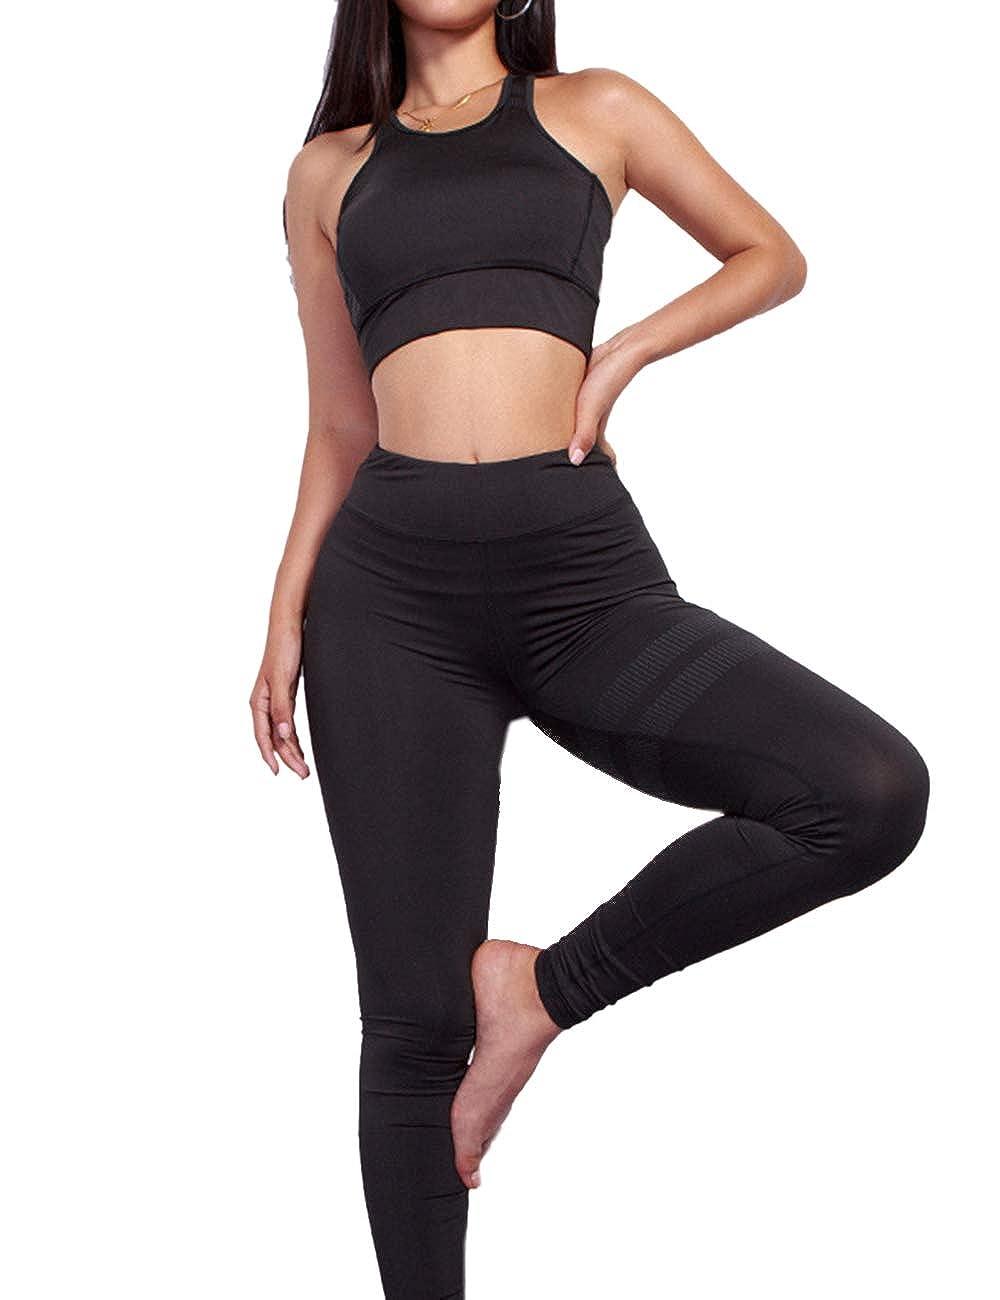 MACCHIASHINE Womens 2 PCS Pattern Print Sports Bra Pants Set Yoga Wear Set Racerback Bra and Leggings Tights(BL2.S)